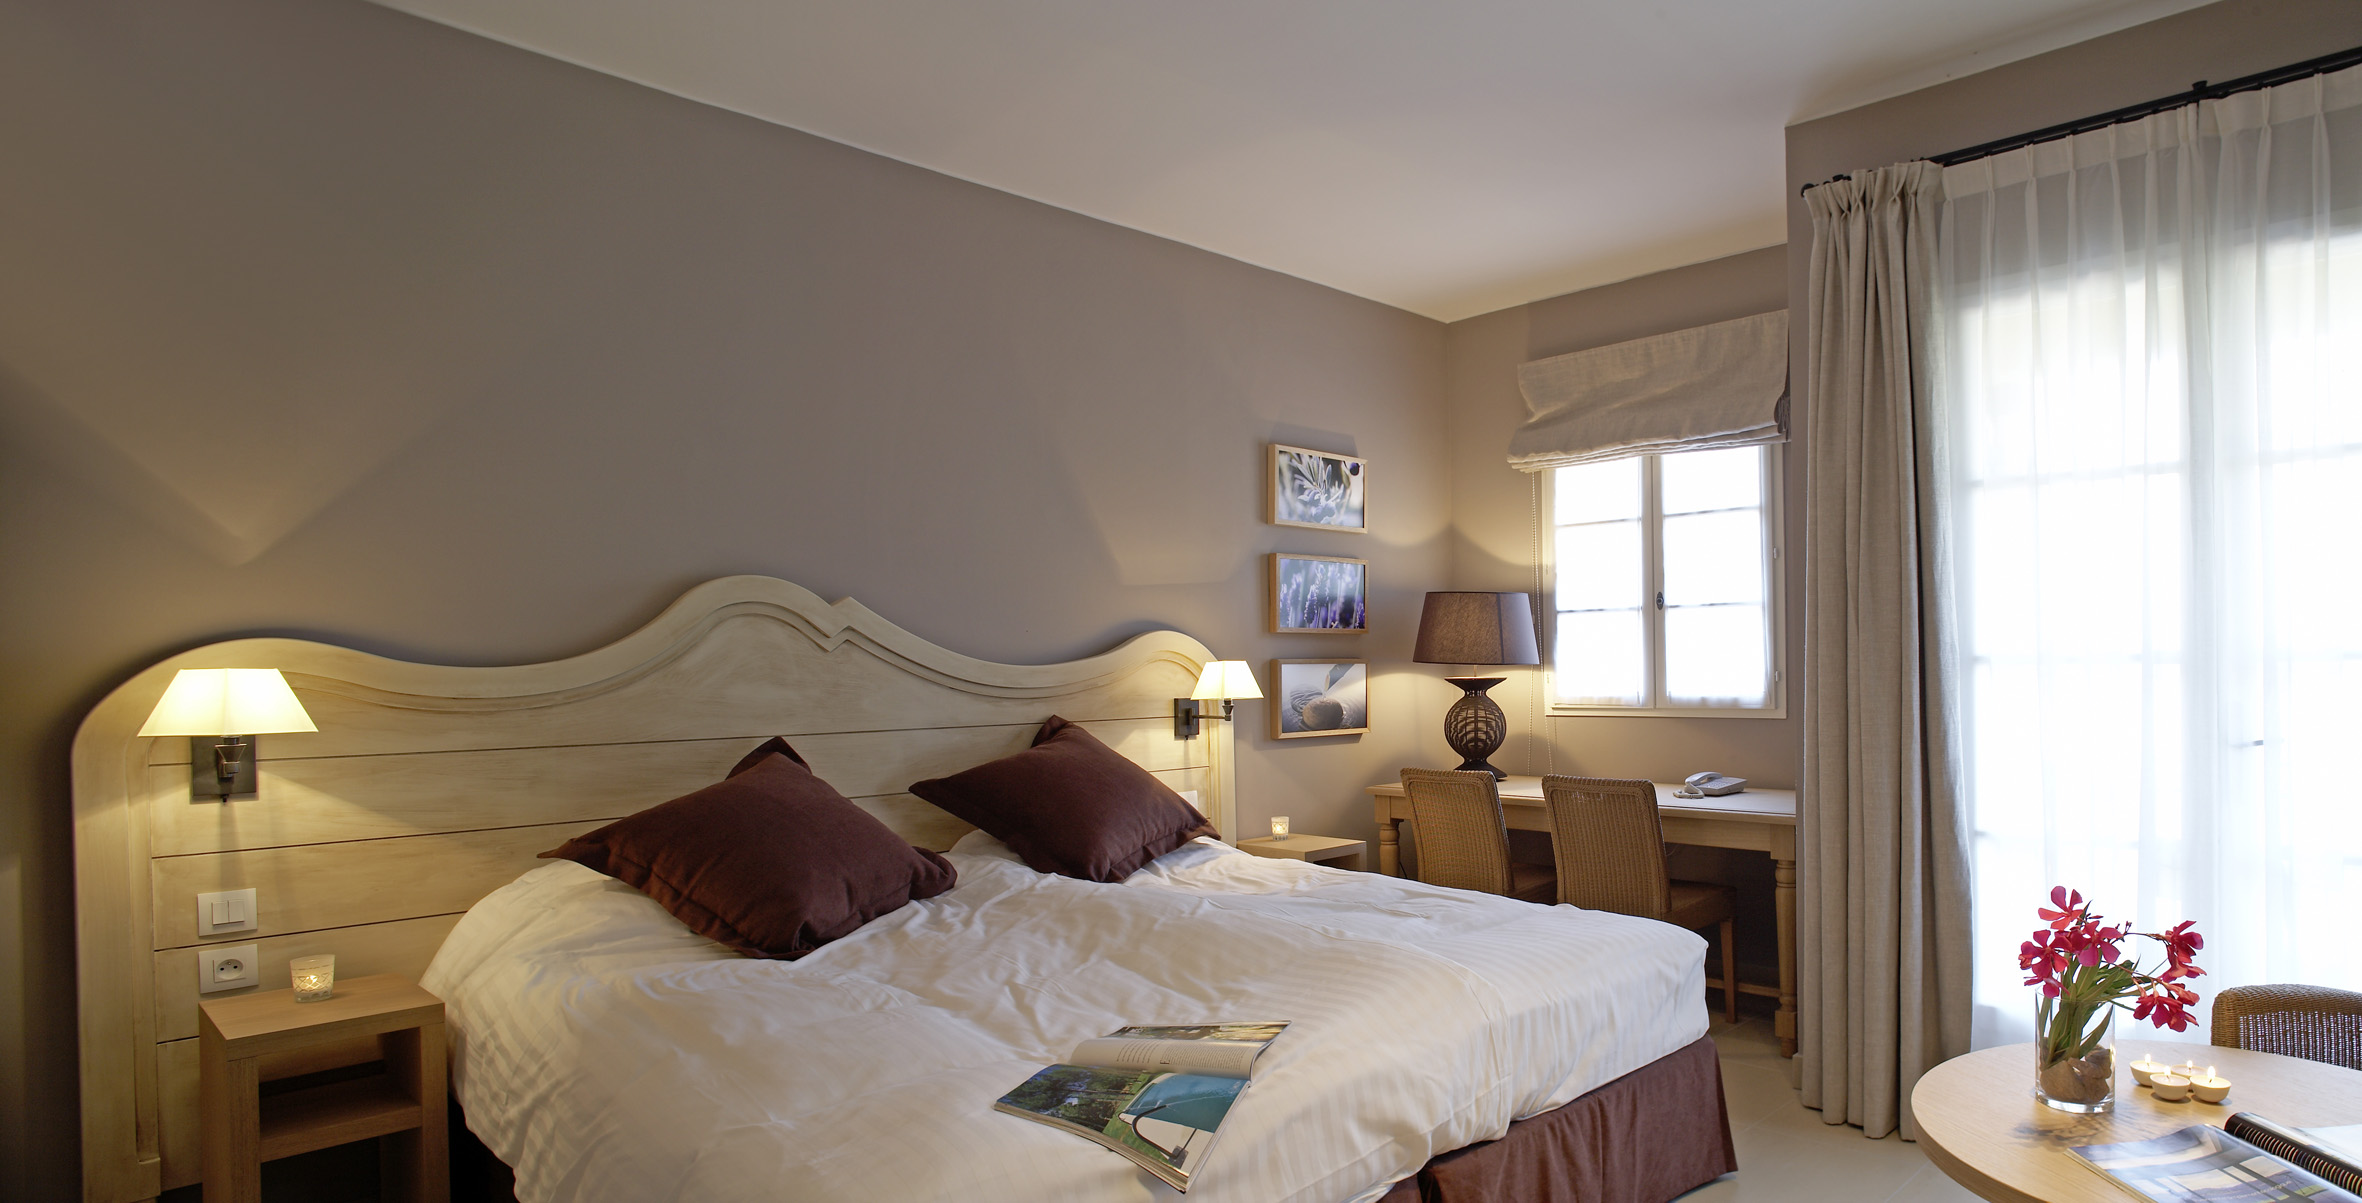 golf-expedition-golf-reizen-frankrijk-regio-cote-d'azur-Les-Domaines-de-Saint-Endréol-Golf-en-Spa-Resort-slaapkamer-2-personen